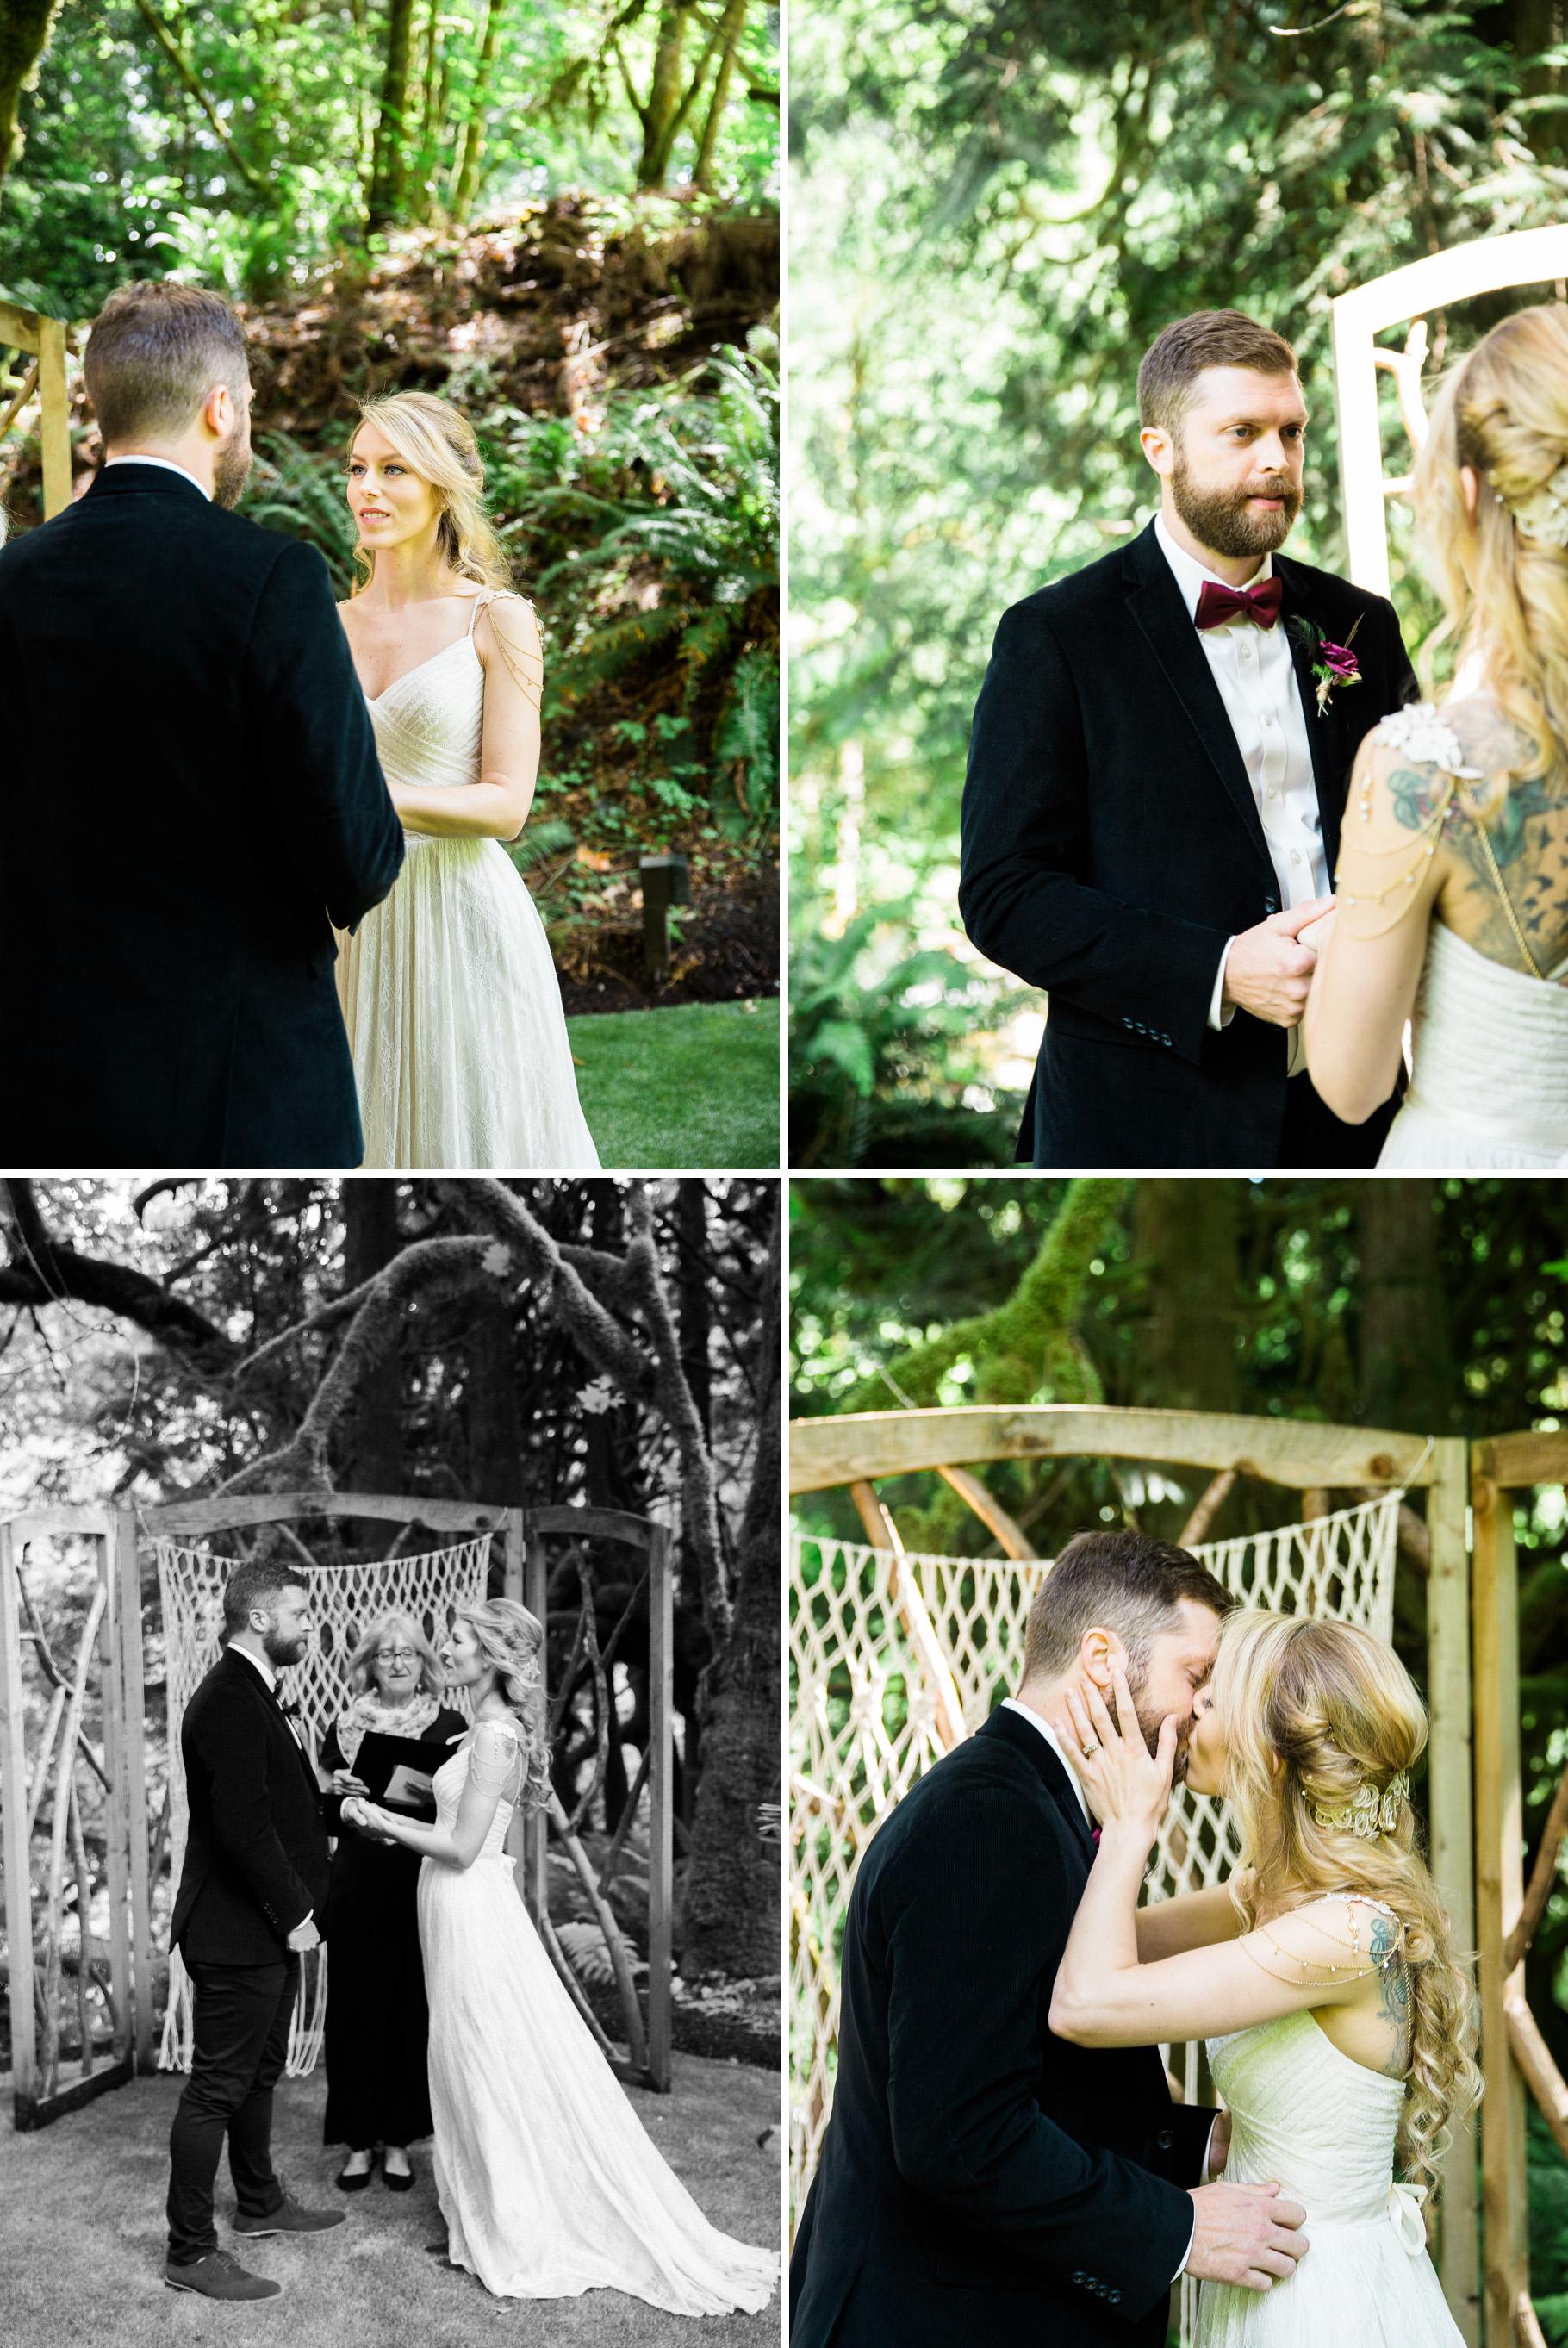 13-Treehouse-Point-Elopement-Seattle-Wedding-Photographer-Ceremony